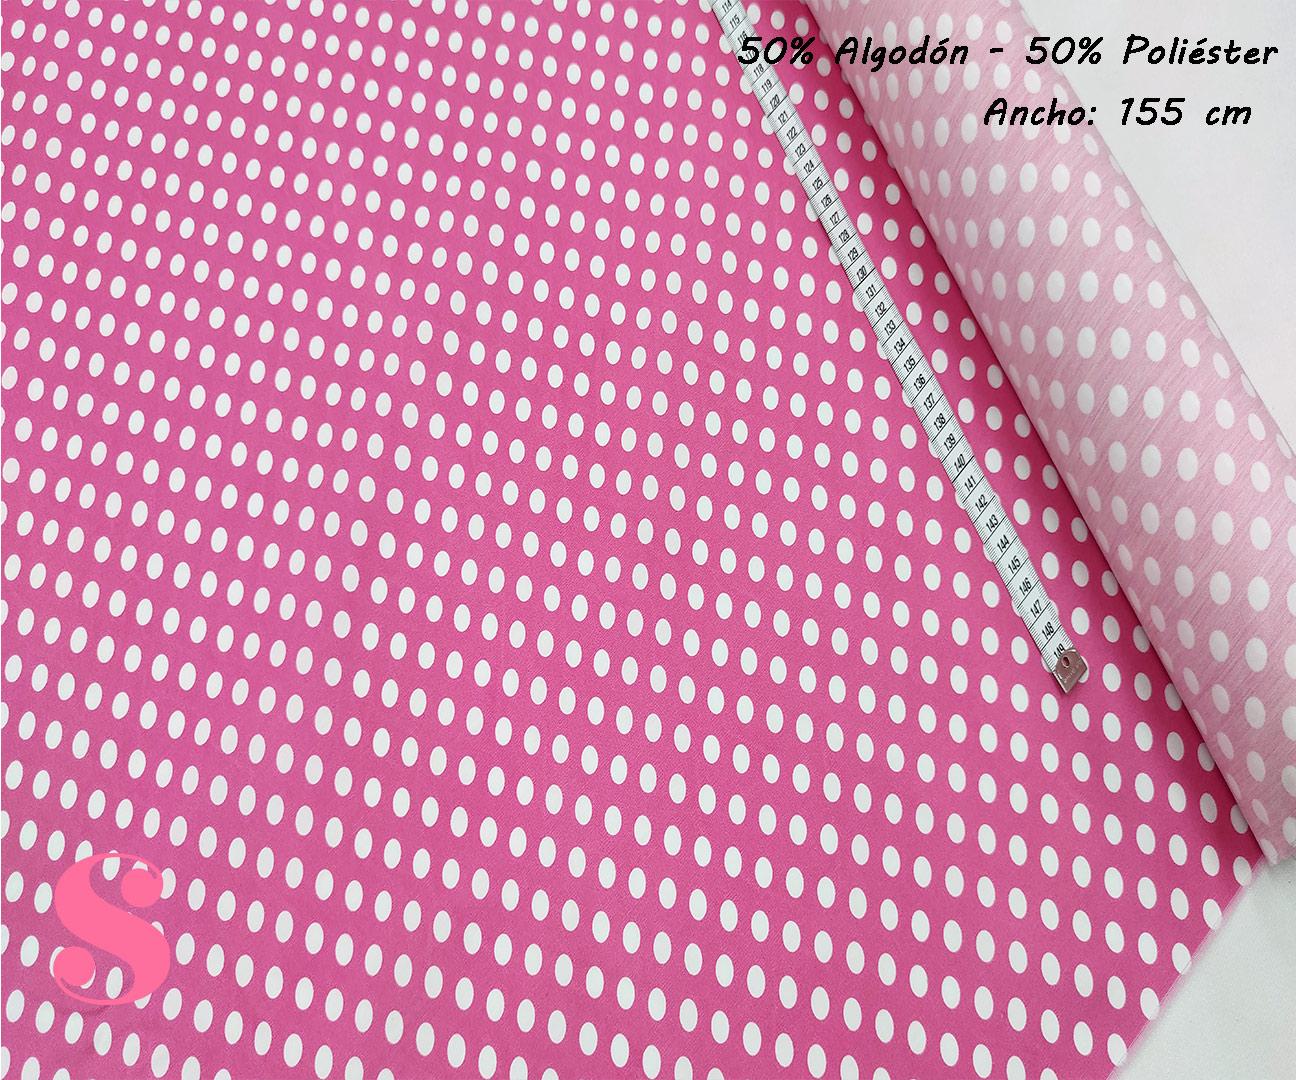 F7-lunar-flamenco-mediano-blanco-fondo-rosa,Tejido Estampado Lunar Flamenco Mediano Blanco fondo Fucsia